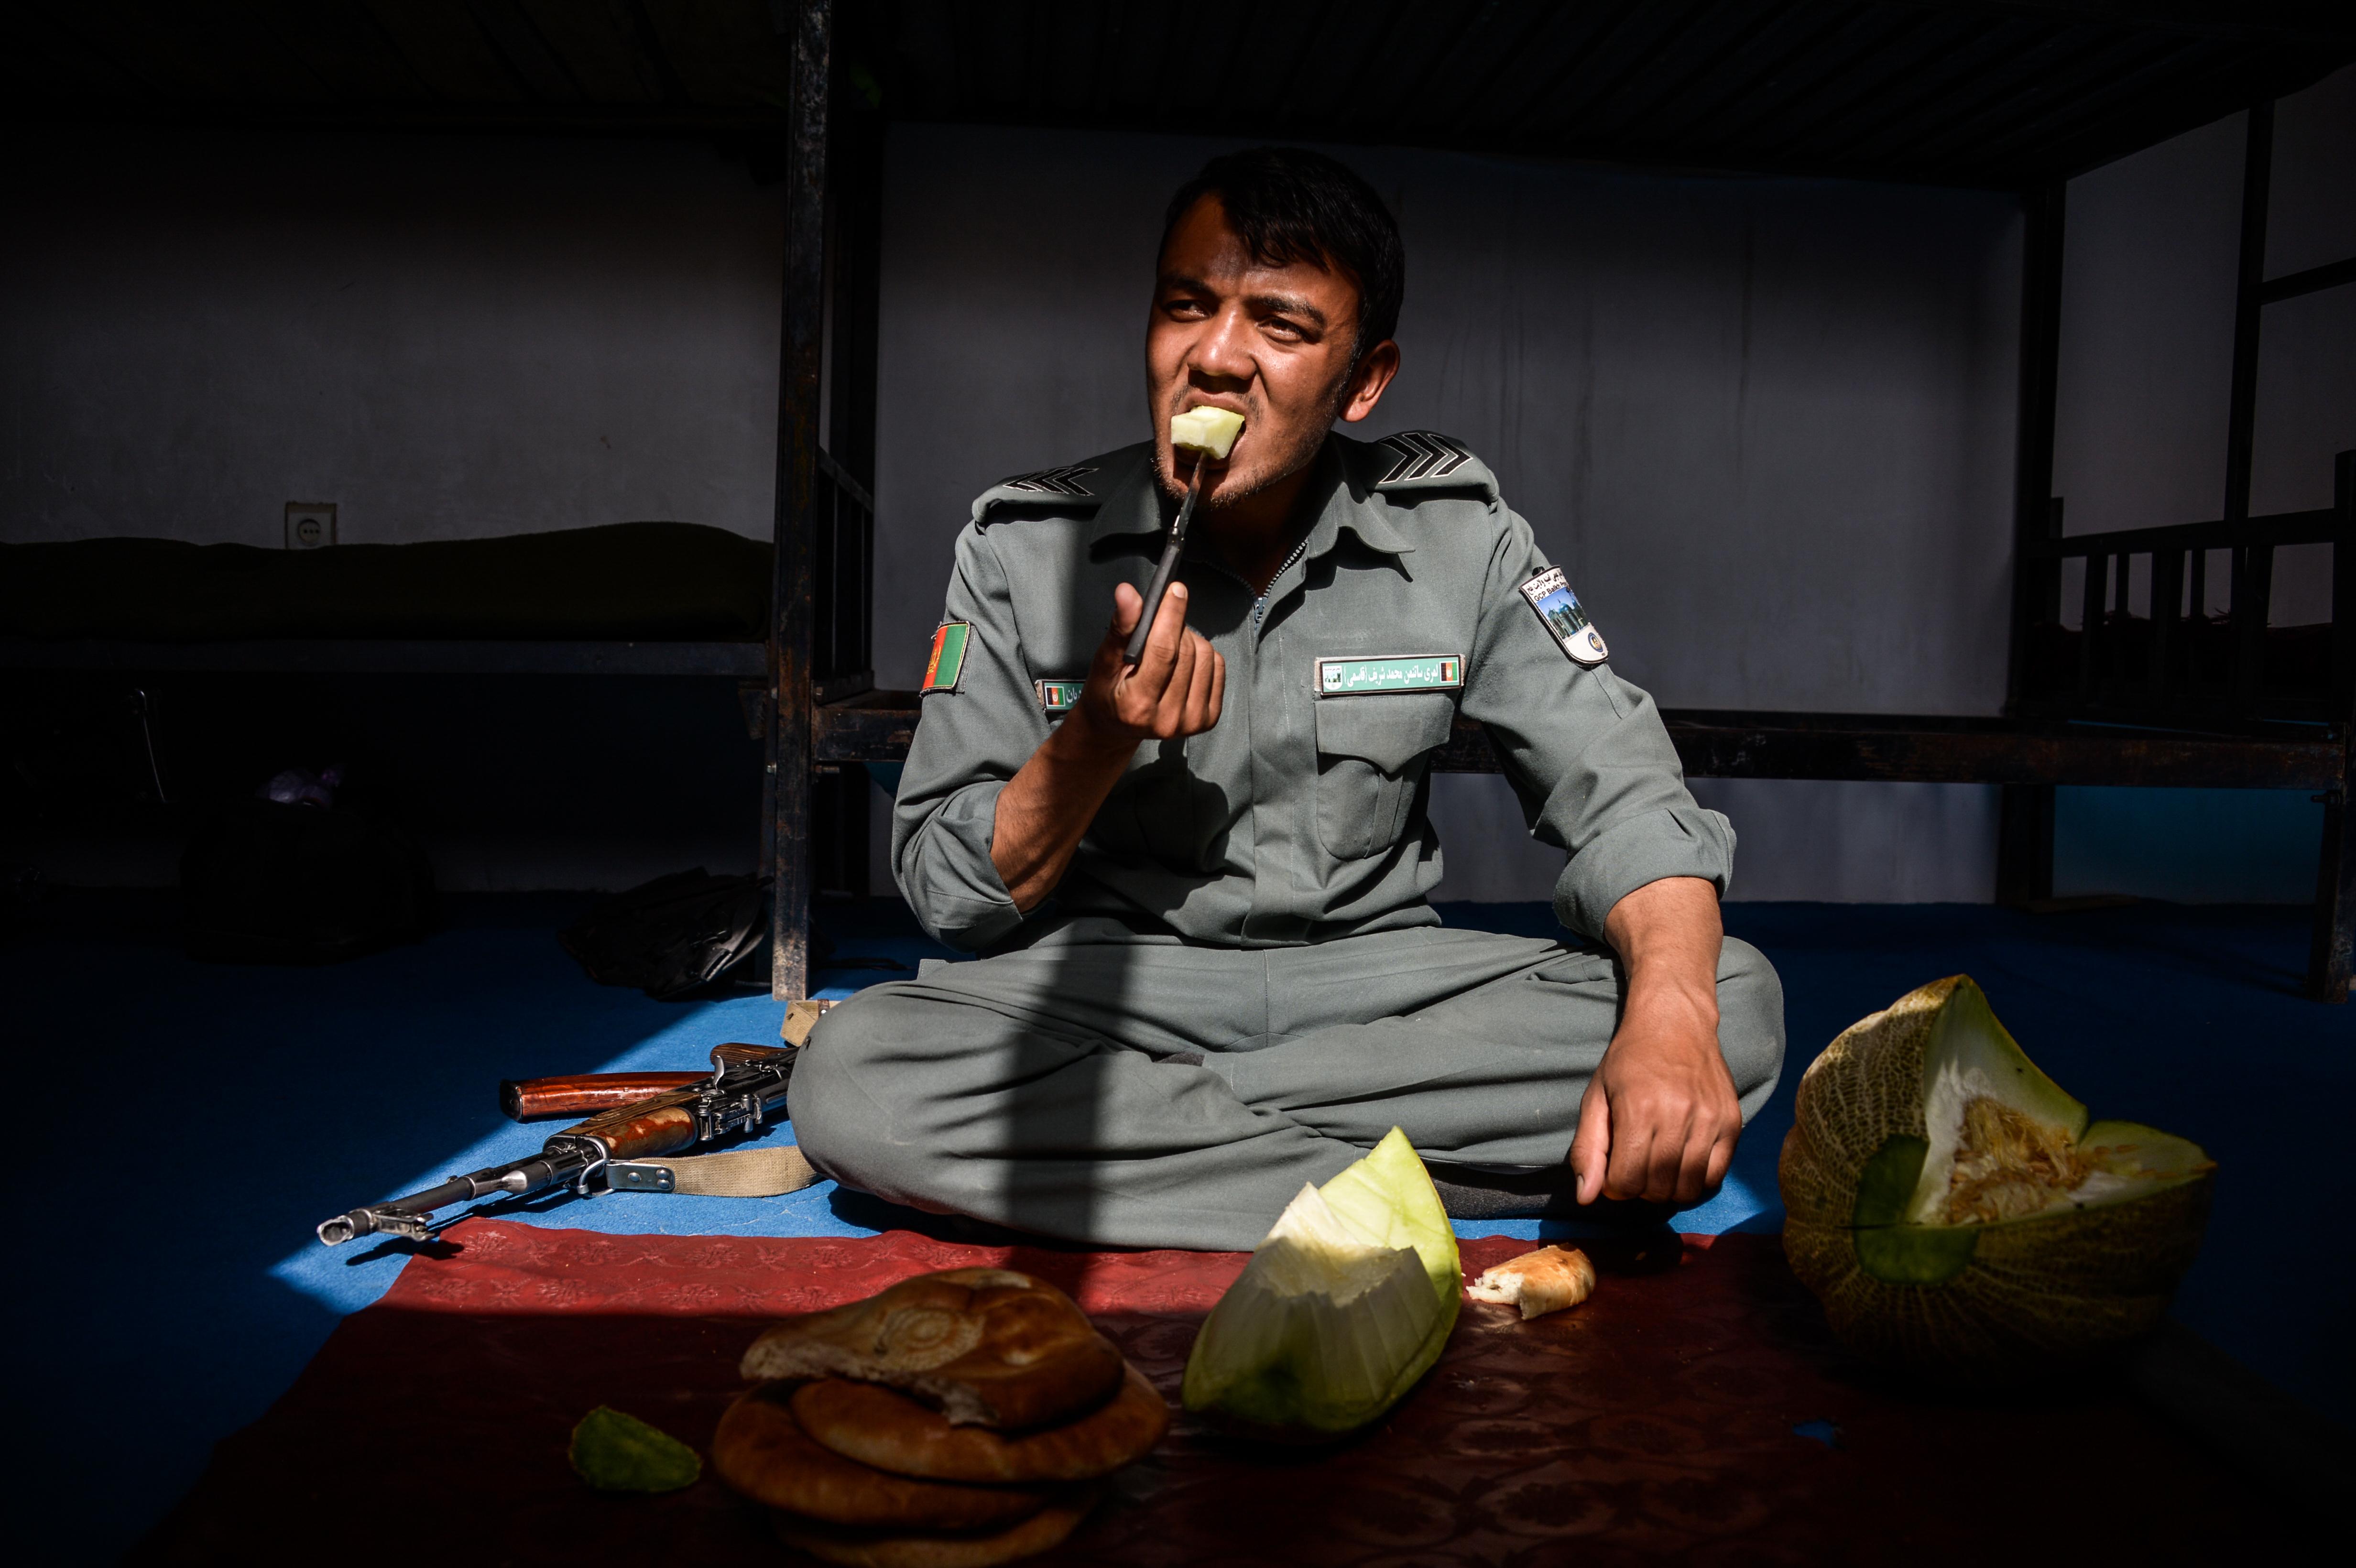 afghan police eating melon